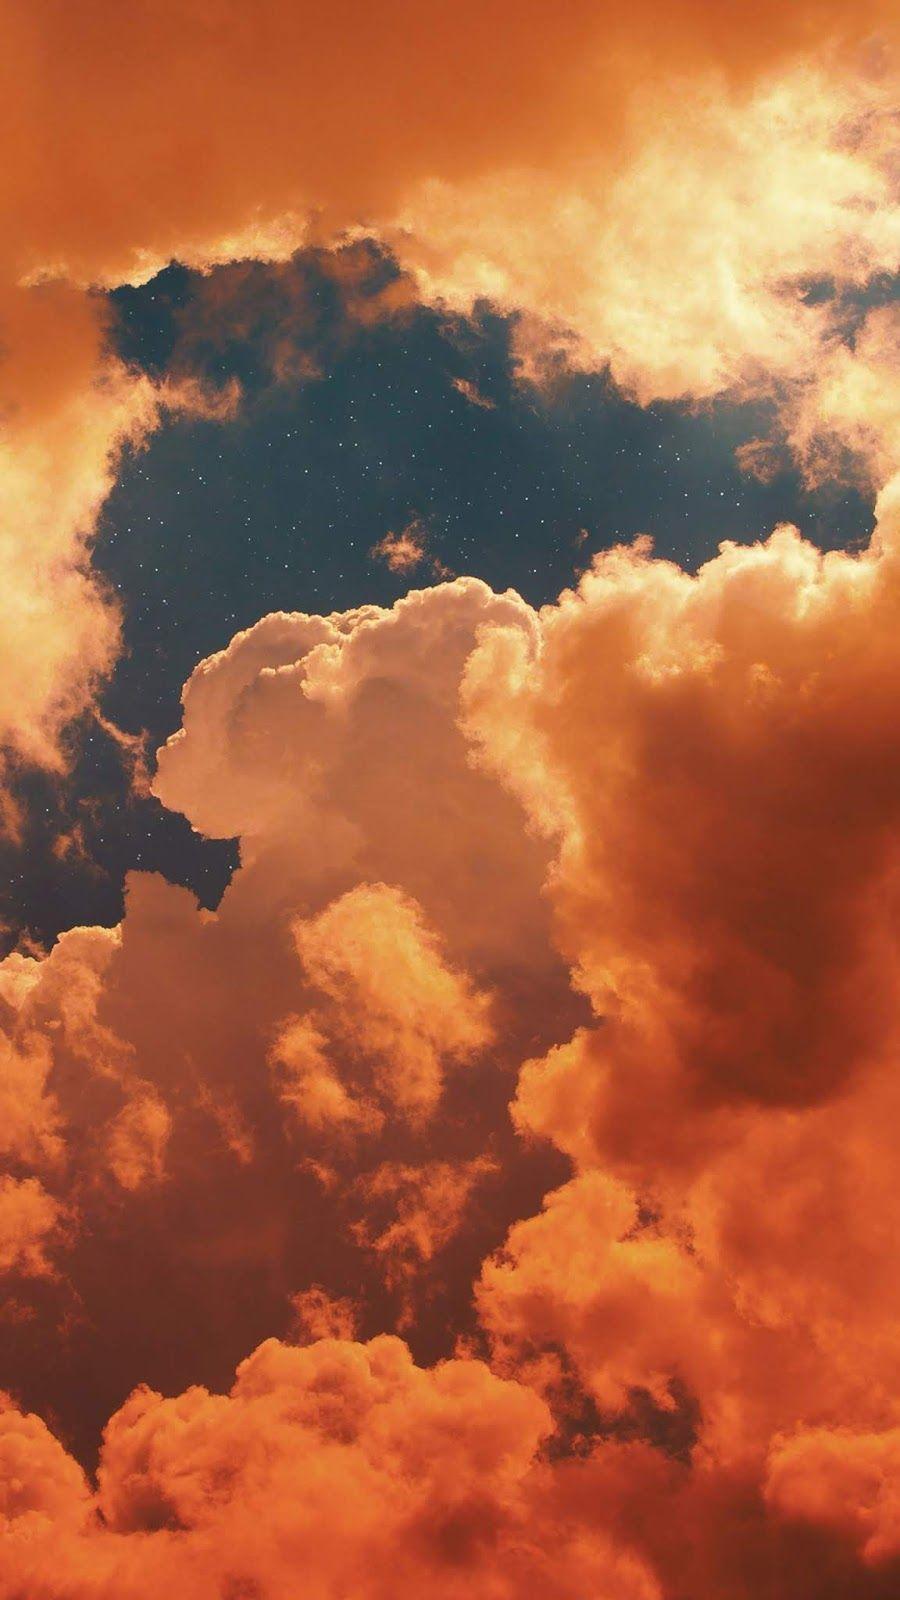 Sunset Cloudy Sky My Favorite Wallpaper Cloudy Favorite Sky Sunset Wallpaper In 2020 Sky Aesthetic Iphone Wallpaper Sky Aesthetic Iphone Wallpaper